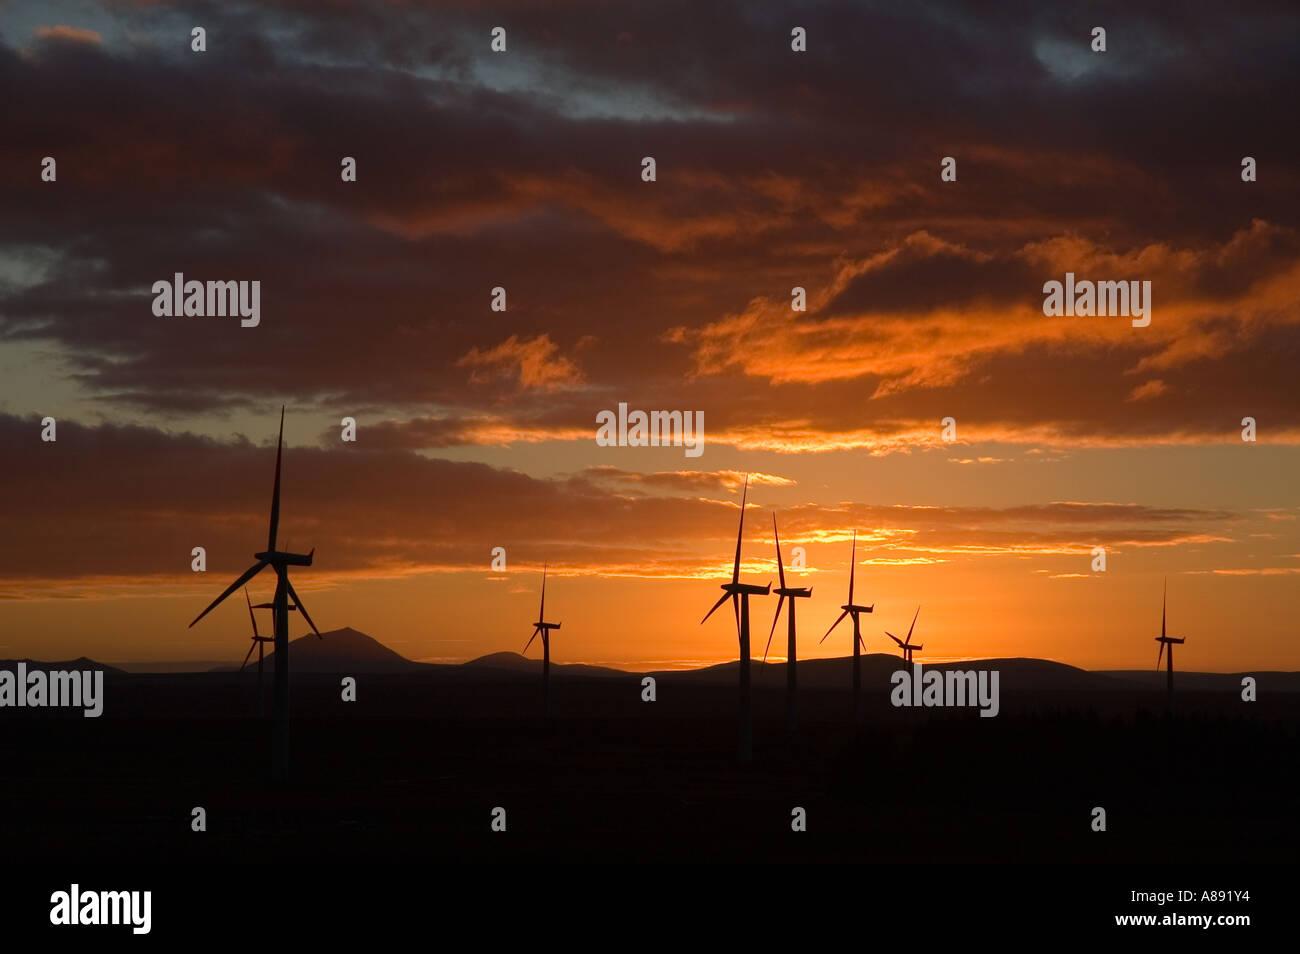 Causeymire wind farm at sunset, Caithness, Scotland, UK Stock Photo